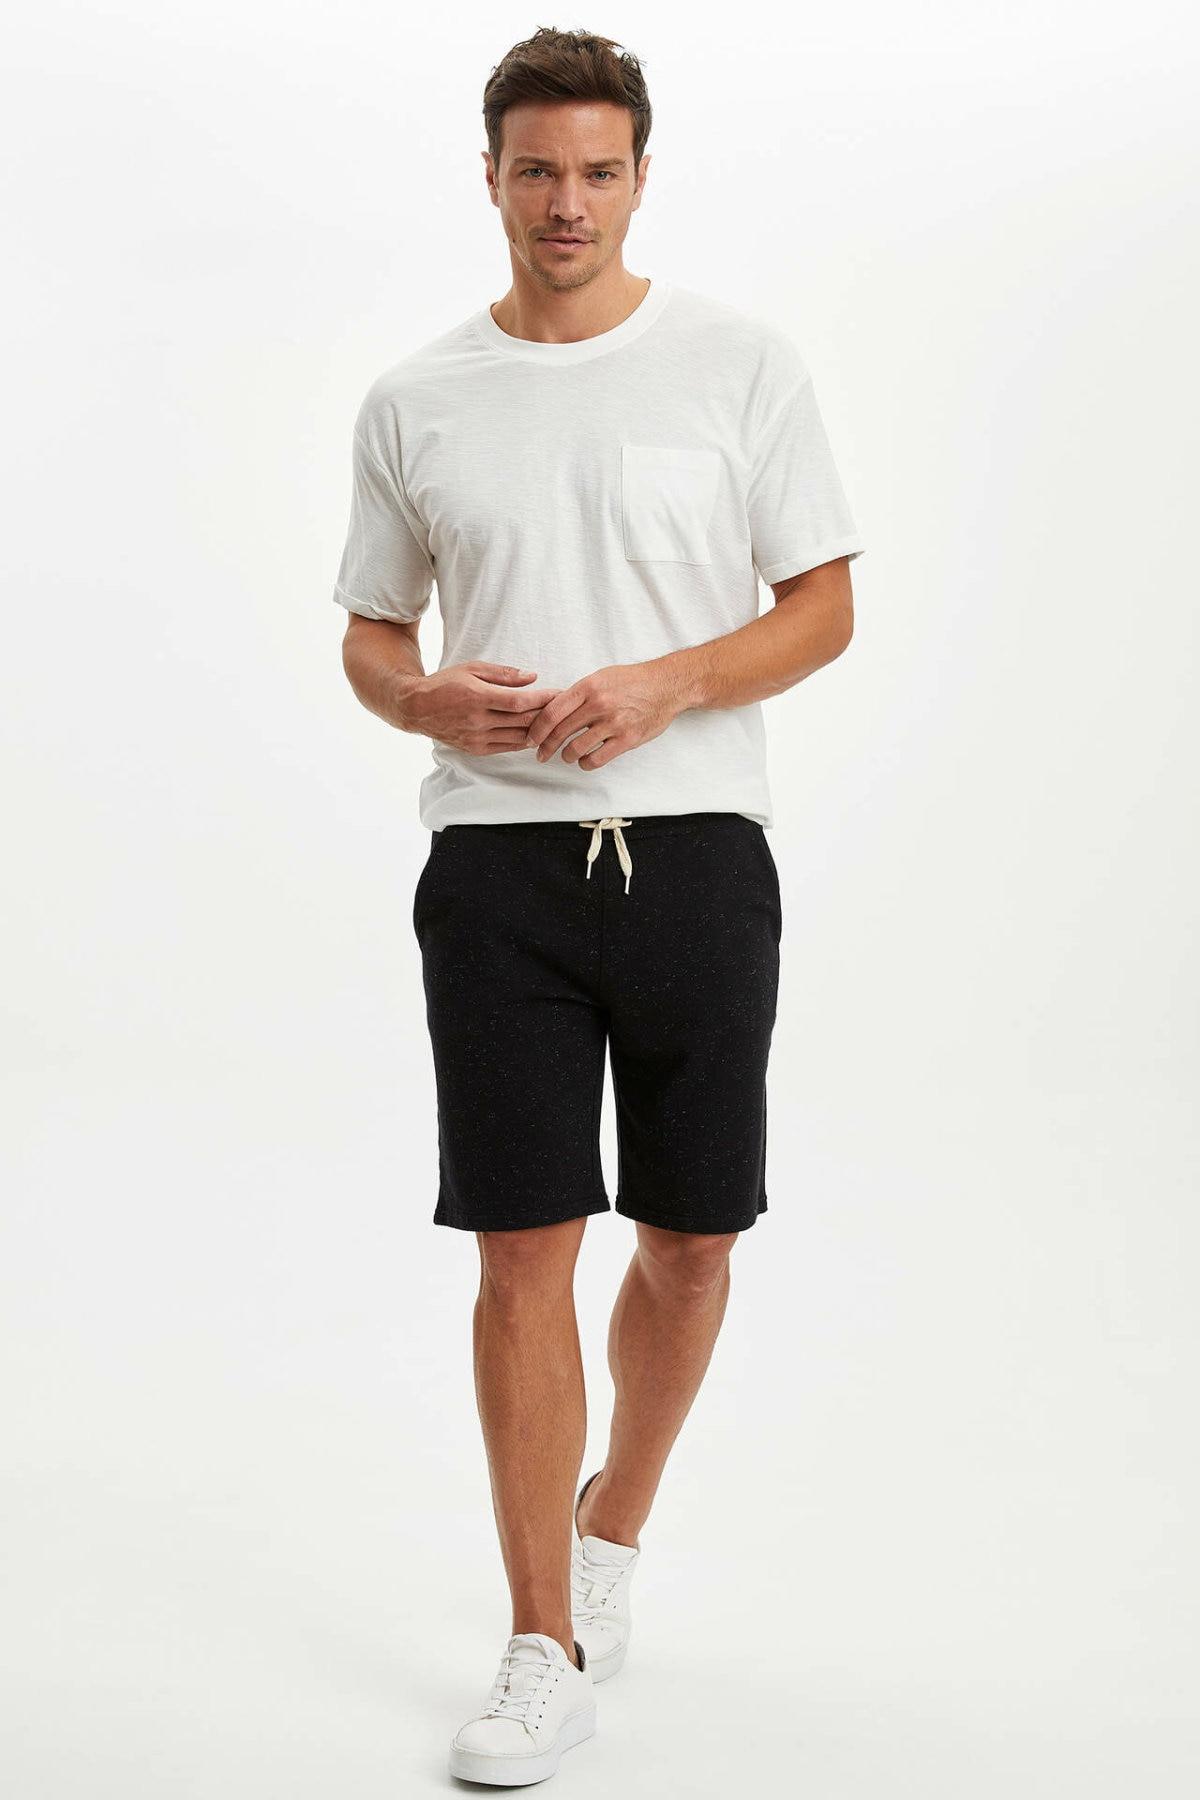 DeFacto Man Short Bottoms Men's Spring Casual Black Shorts Men's Lace-up Loose Shorts Bottom-N0639AZ20SP